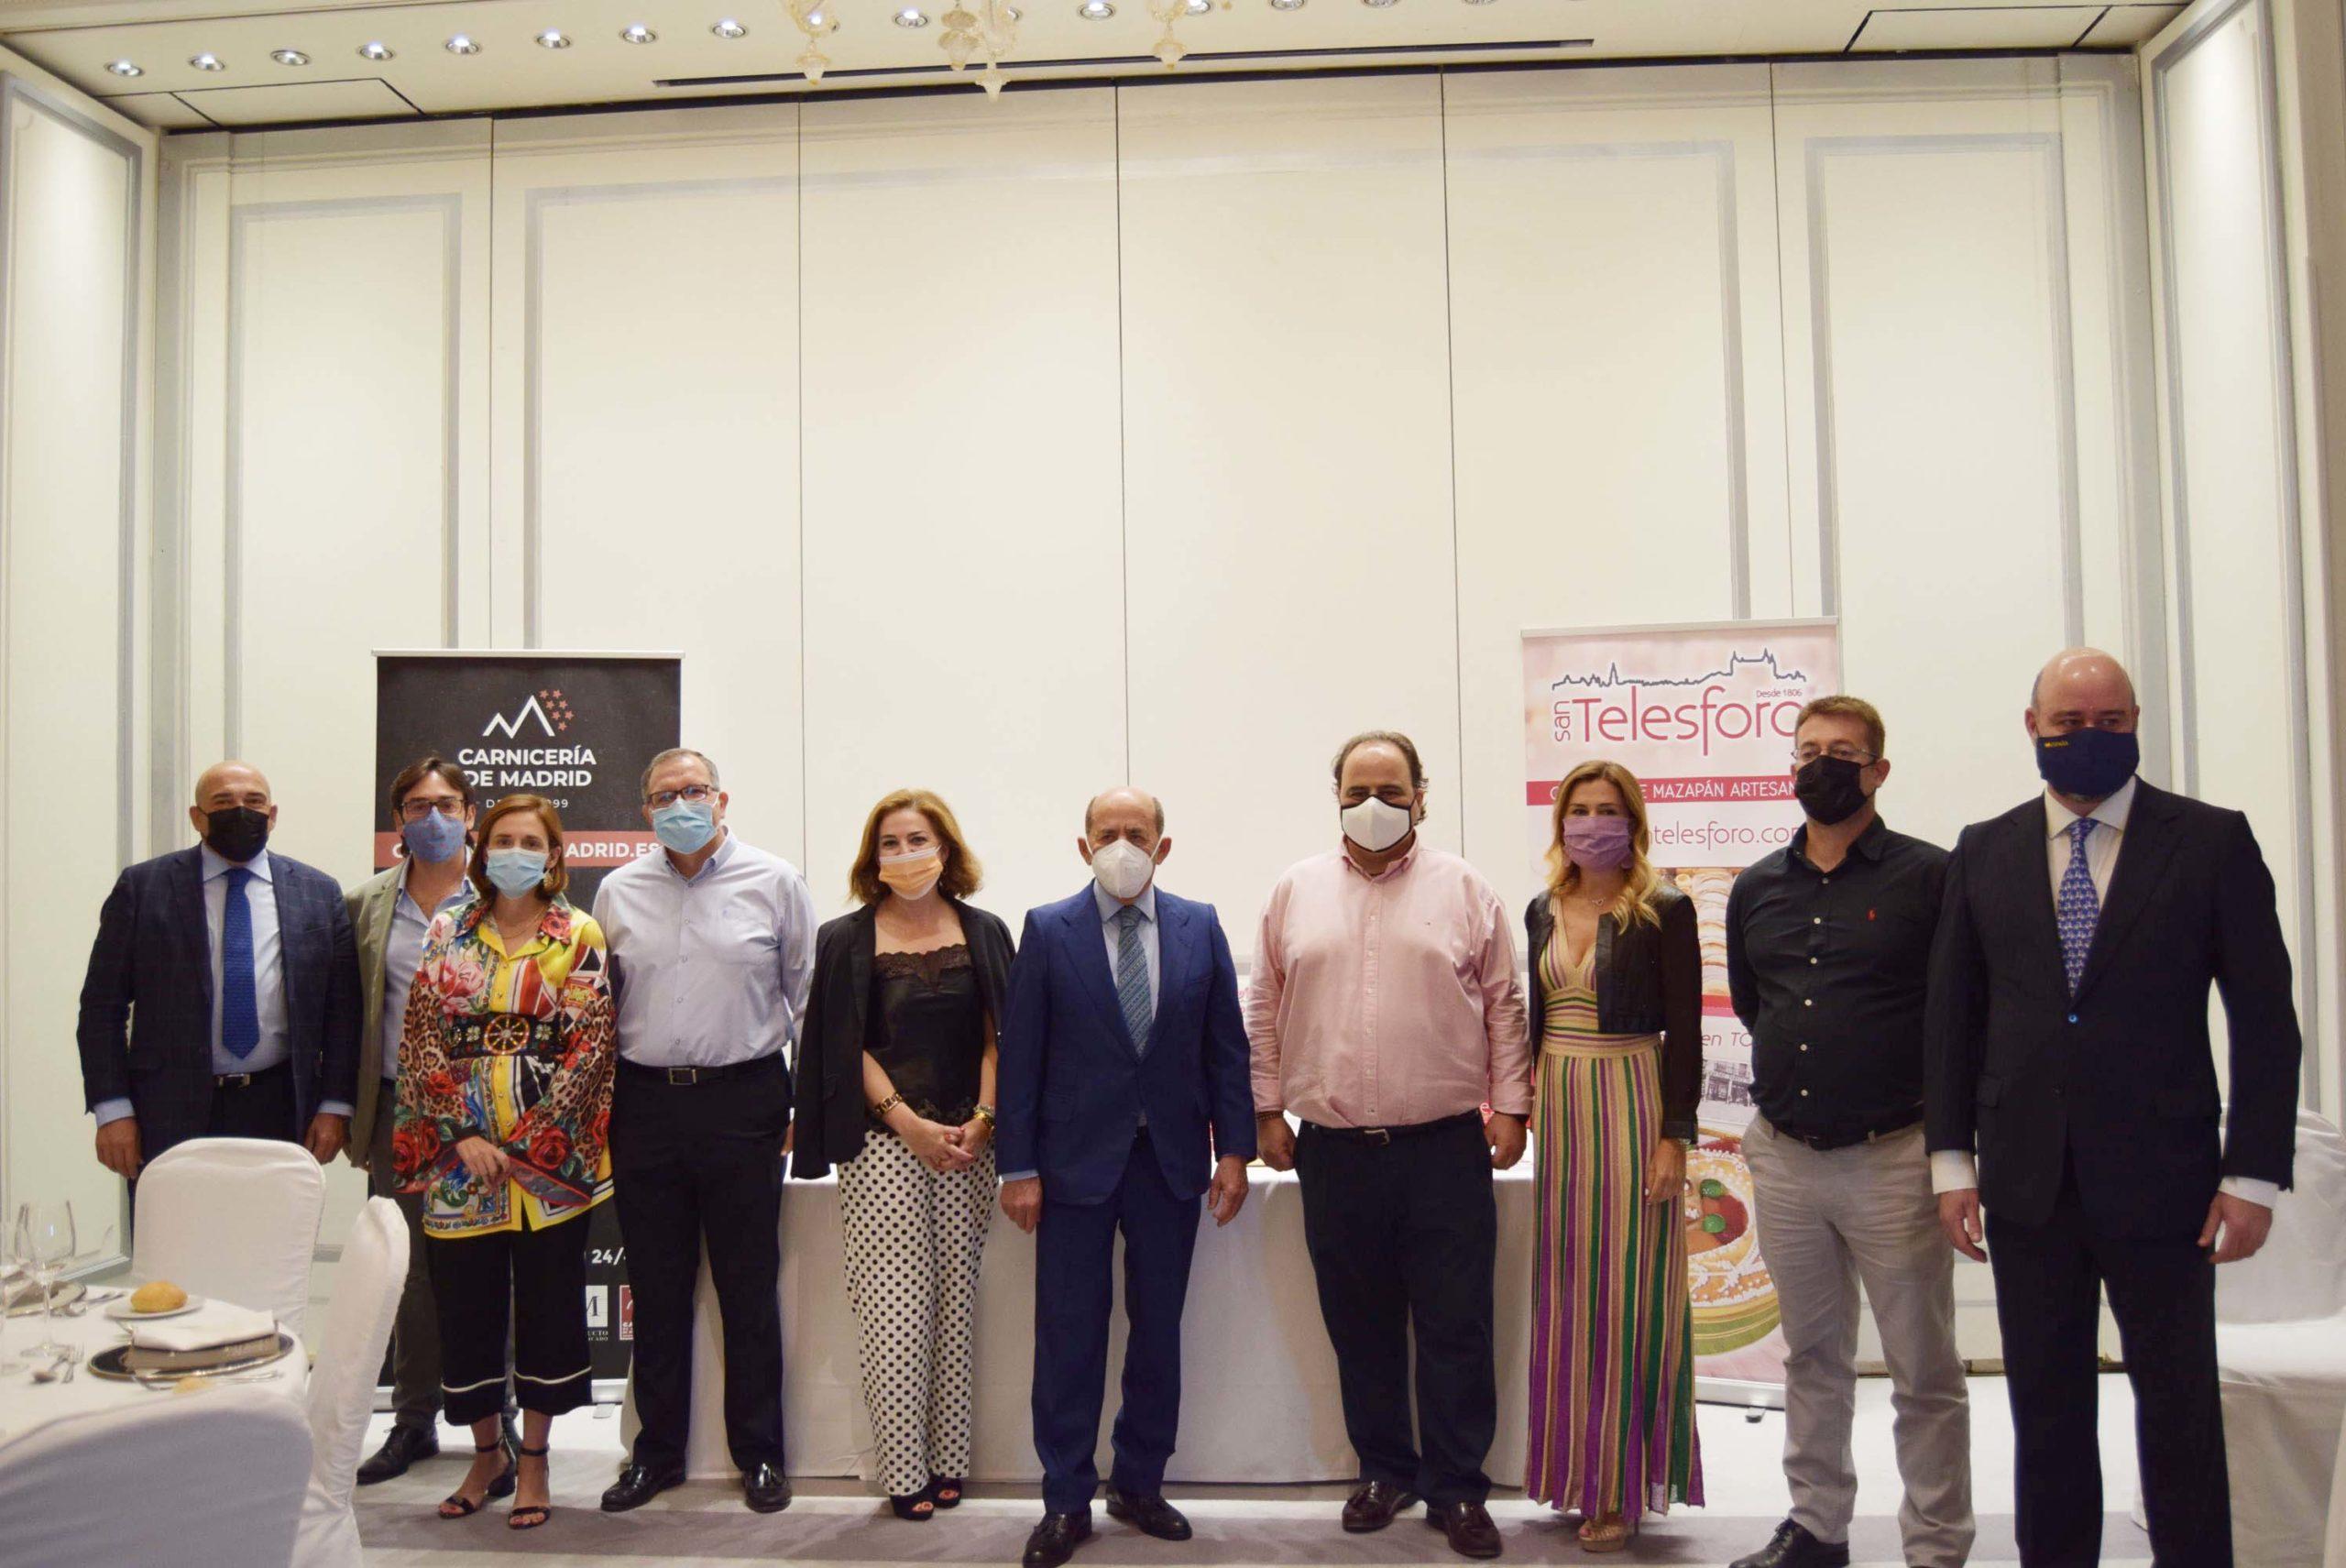 Rutas Gastronómicas de Producto Km.0 de Madrid homenajea a Gerardo Oter